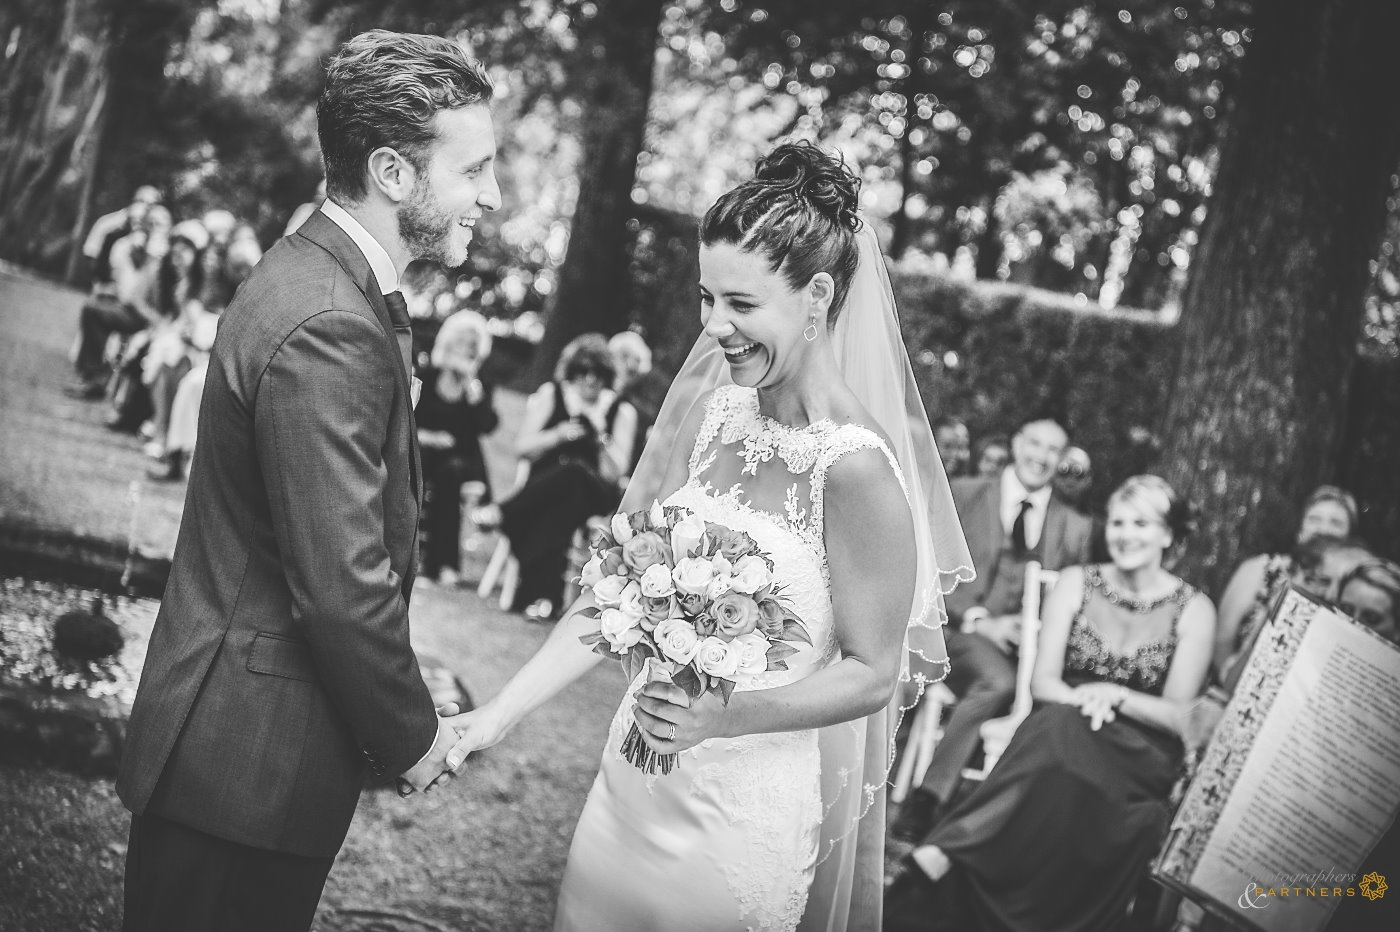 photography_weddings_villa_grabau_06.jpg